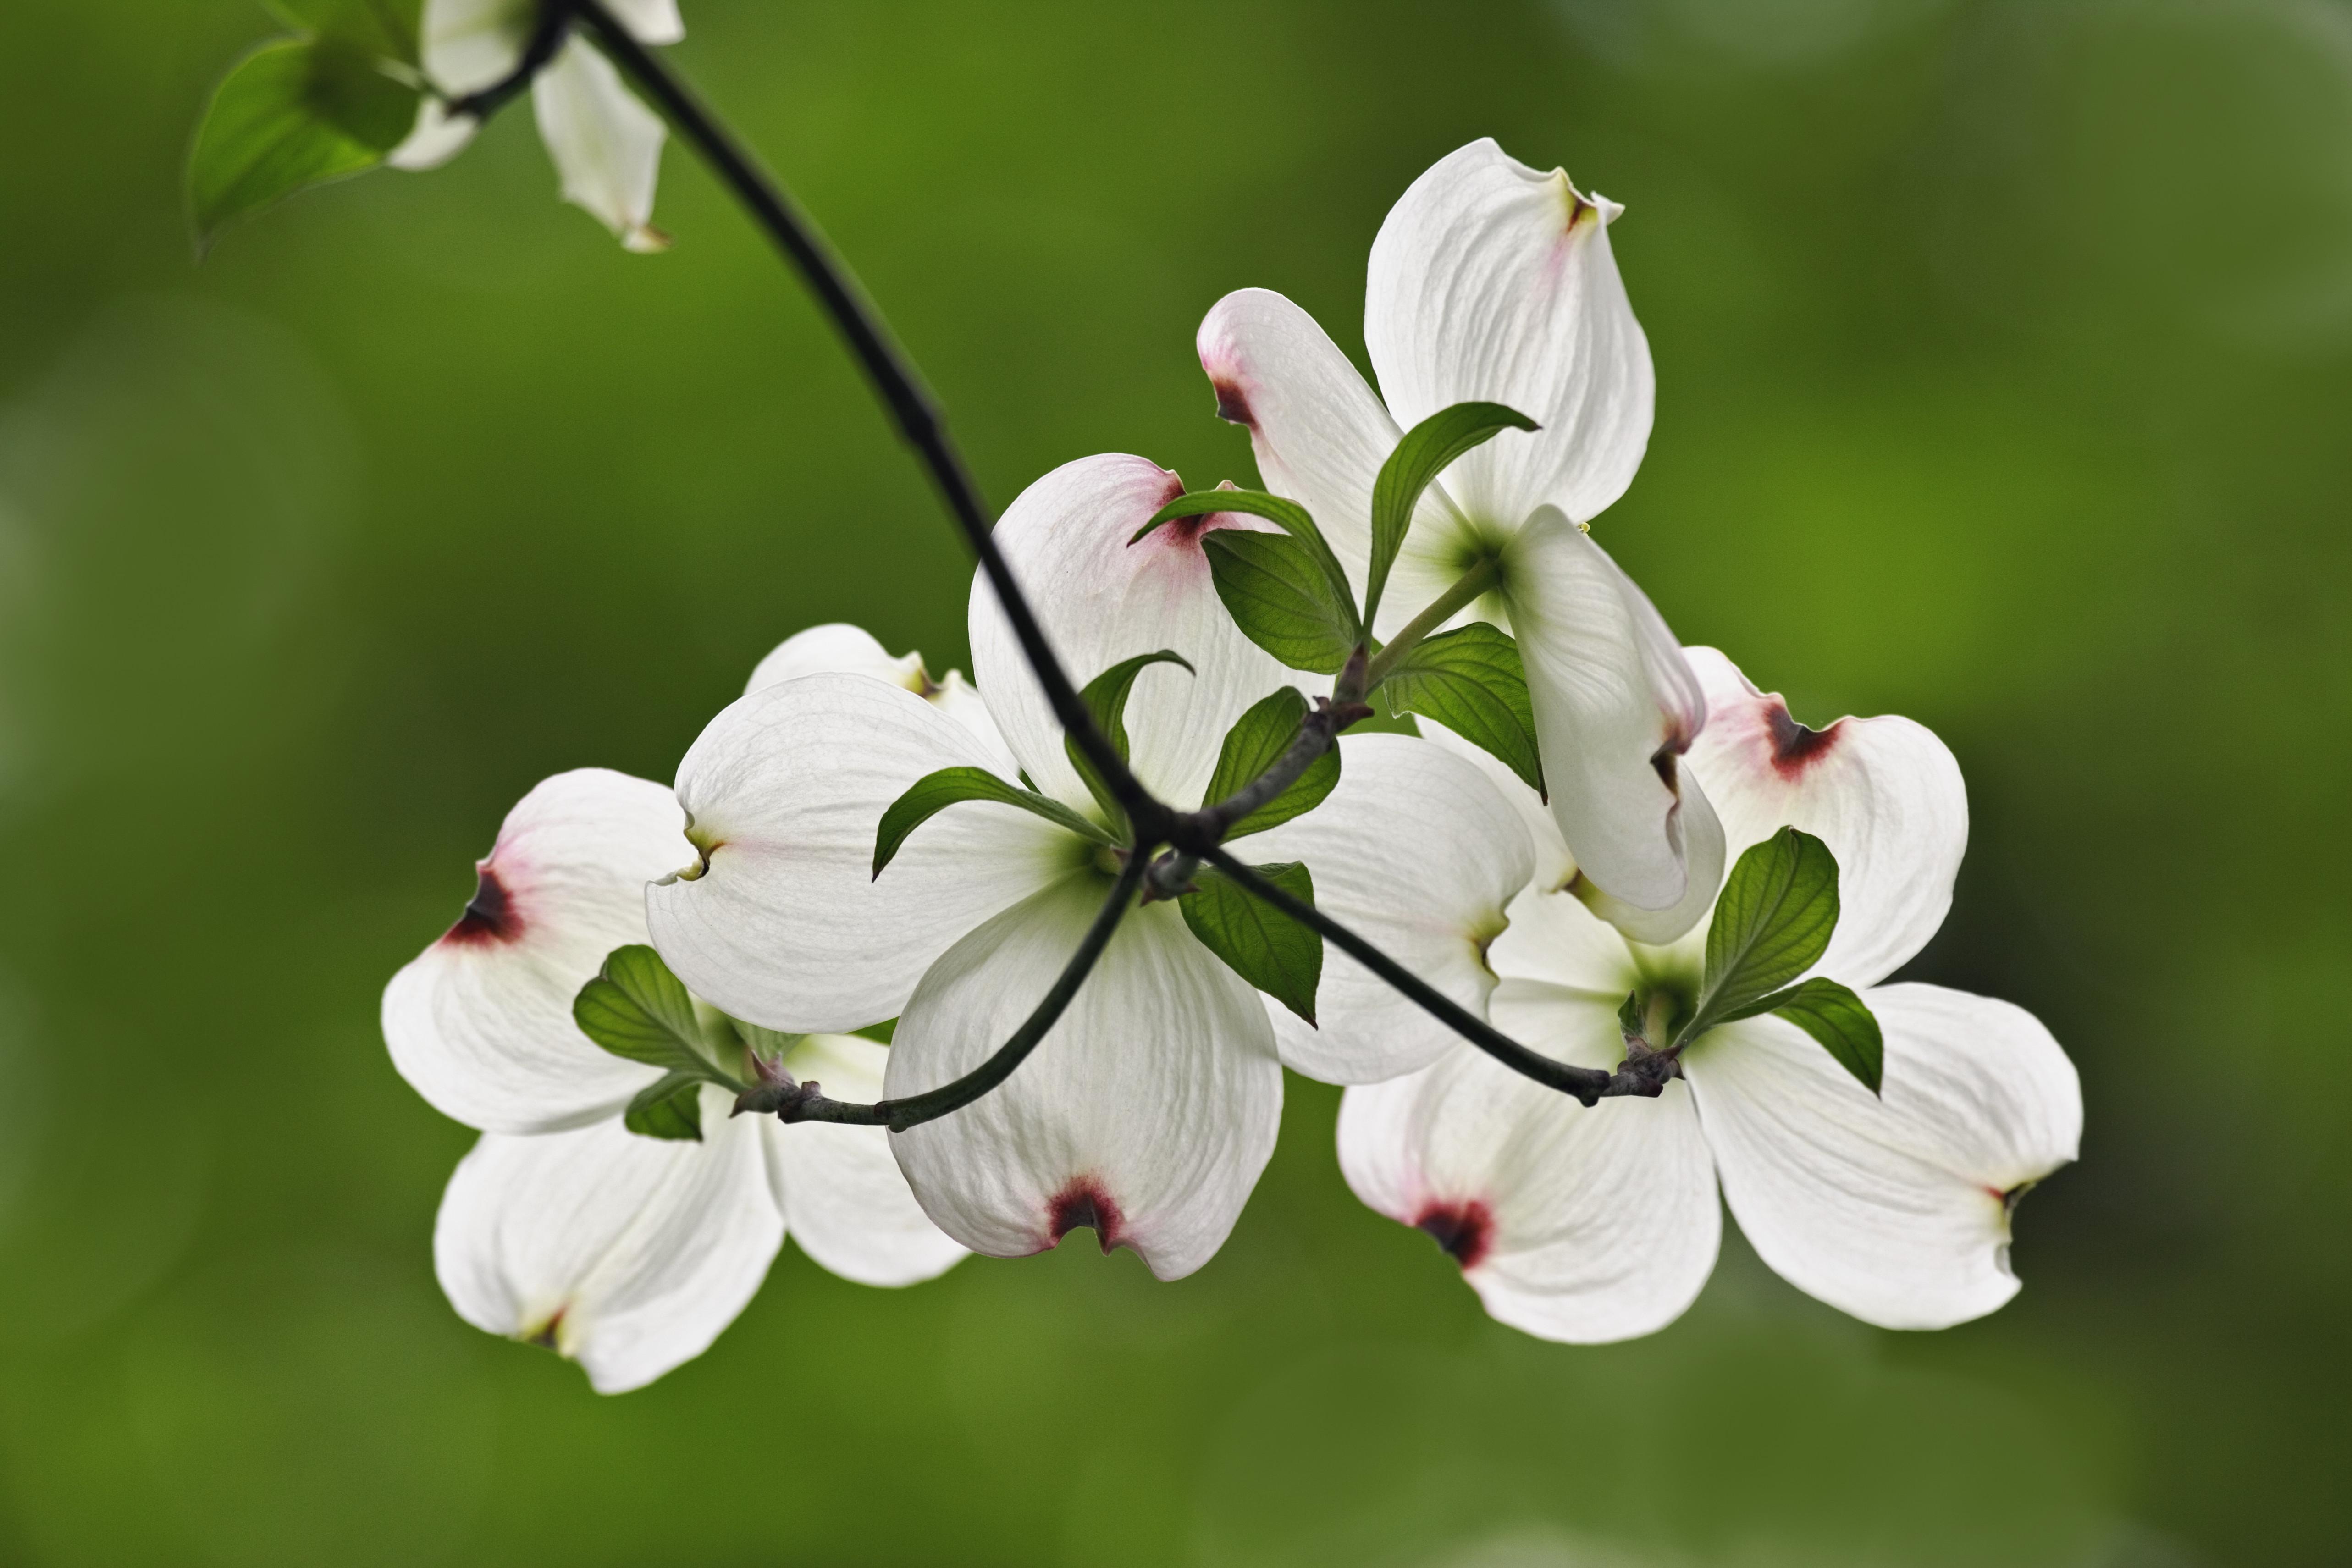 Flowering dogwood blossoms virginia pictures virginia dogwood flowers cornus florida state flower american dogwood commonwealth virginia buycottarizona